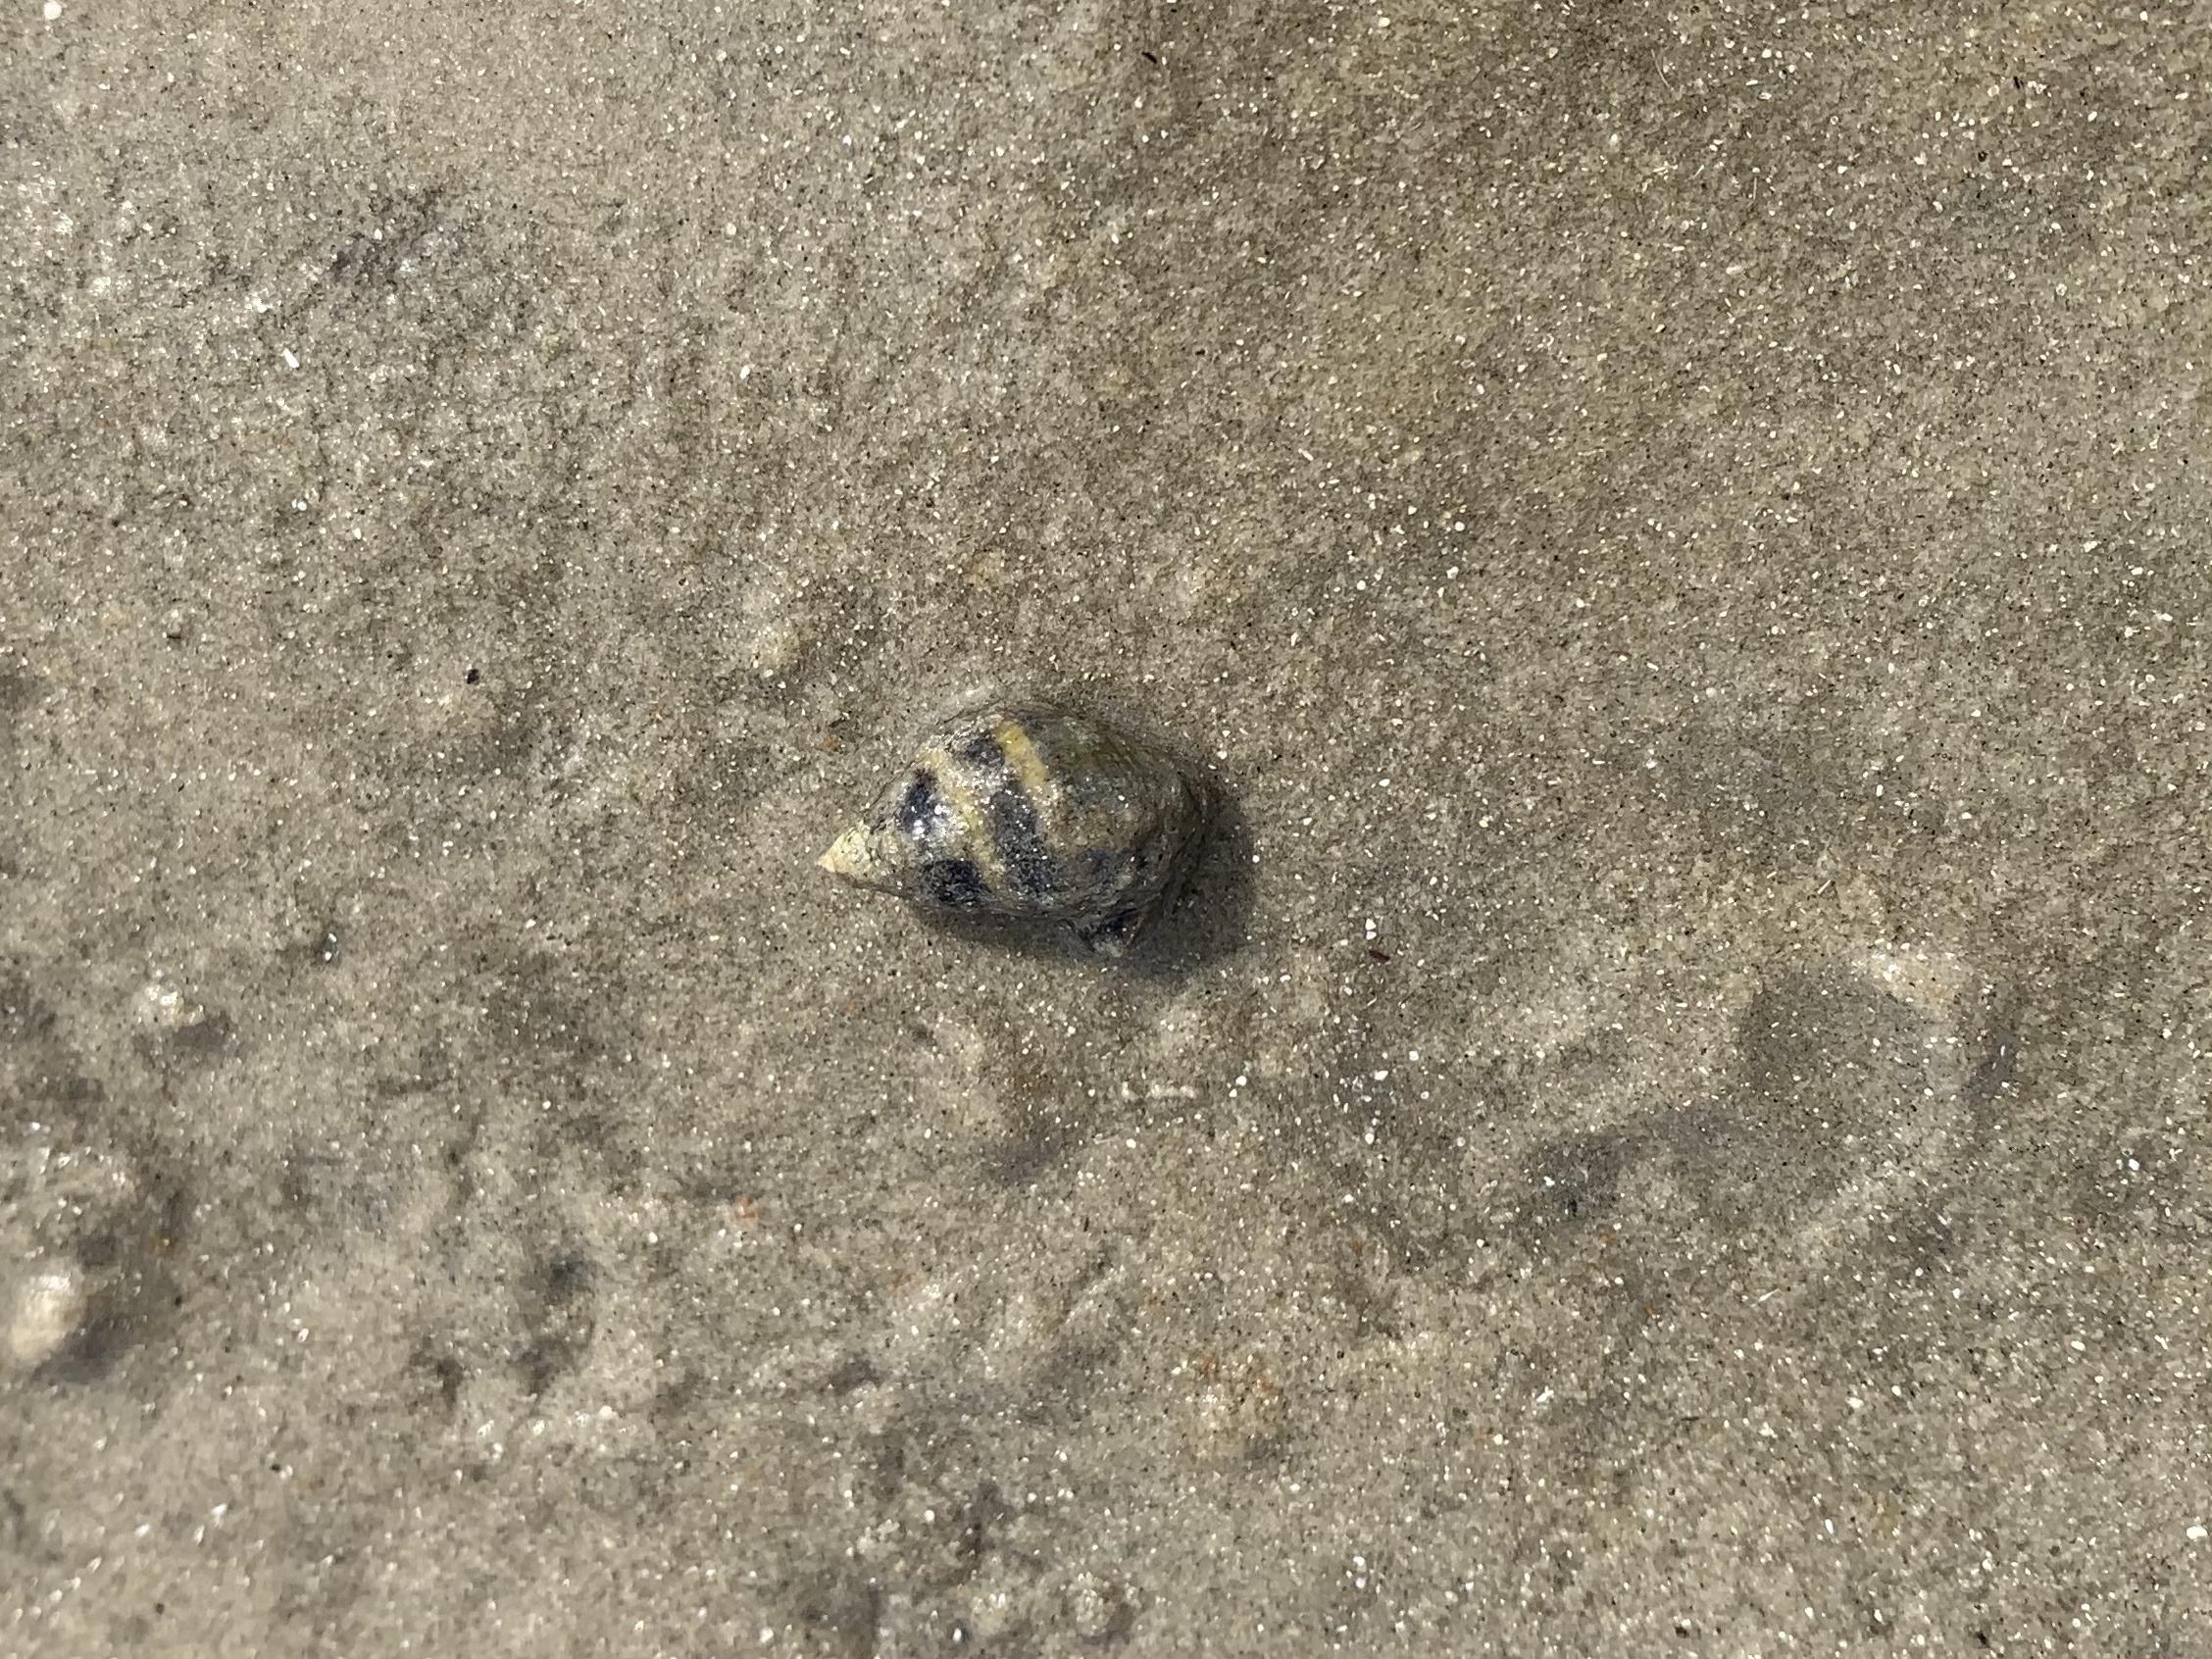 Tiny sea snail with striped shell